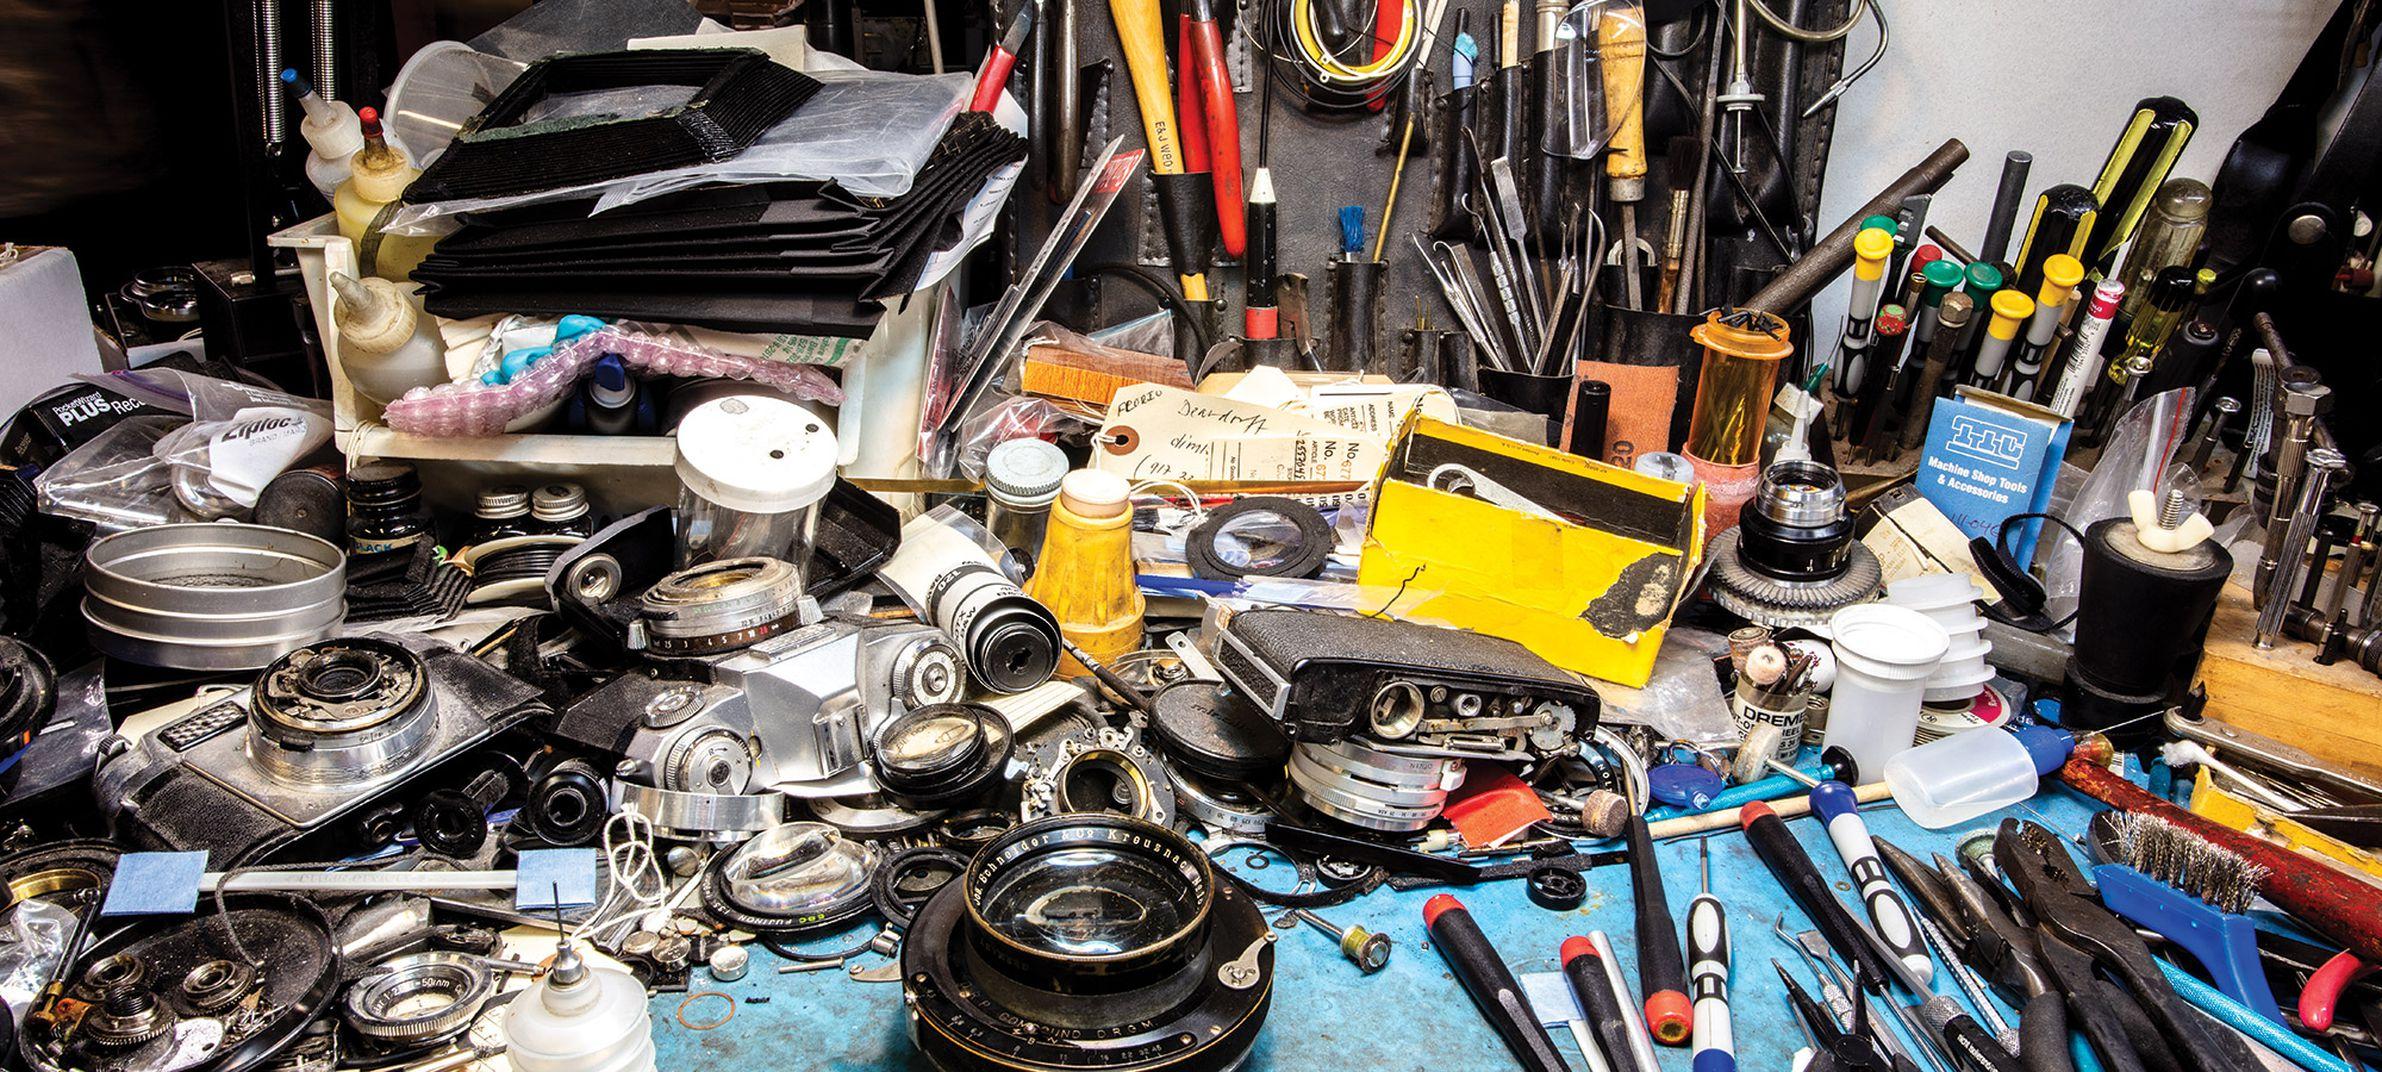 Photo of a camera repair shop in NYC, by Stan Horaczek